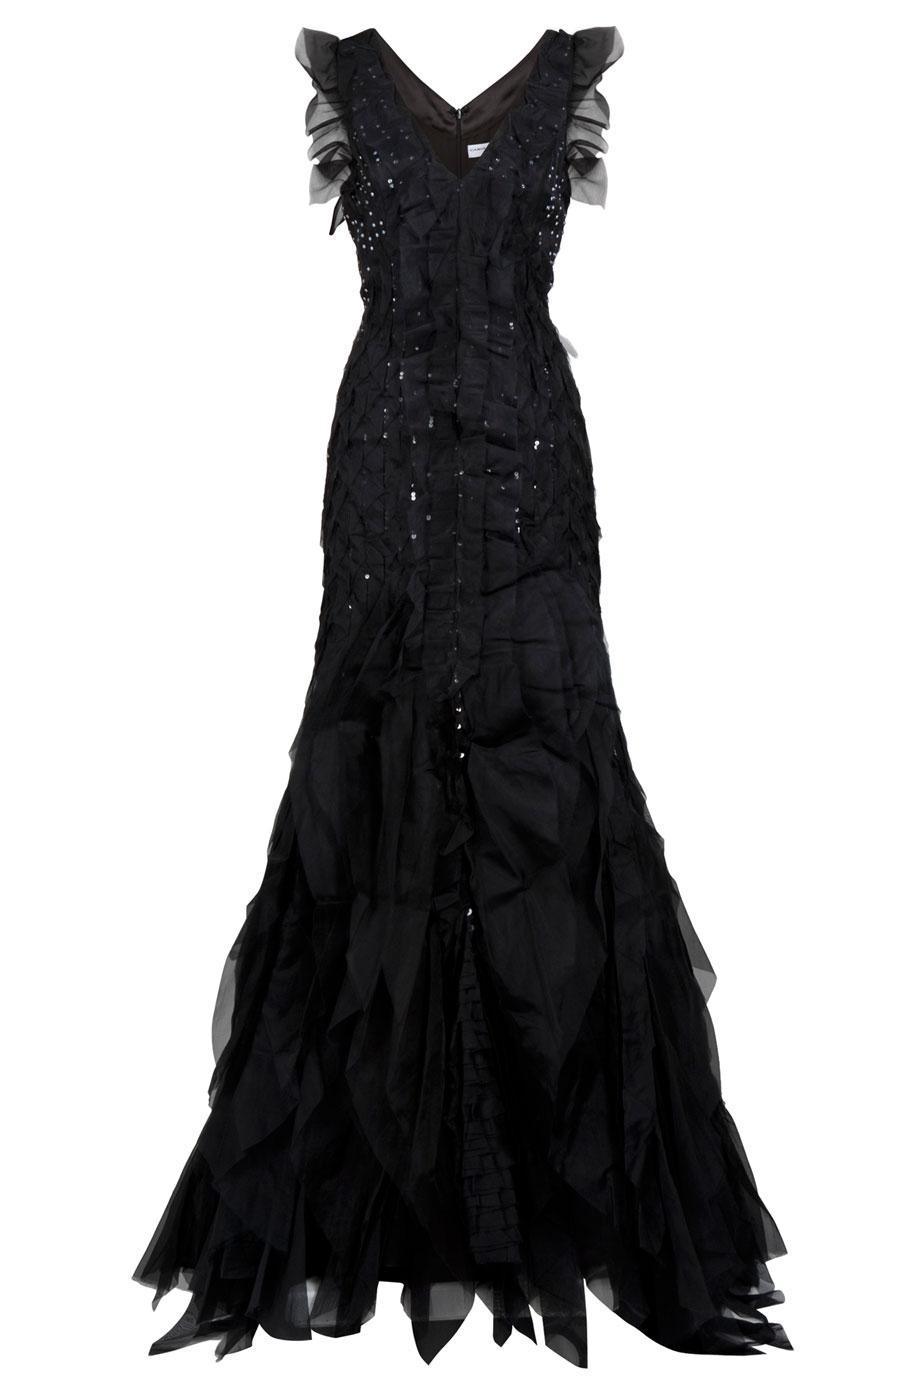 Carolina Herrera Scattered Crystal Gown In Black Lyst